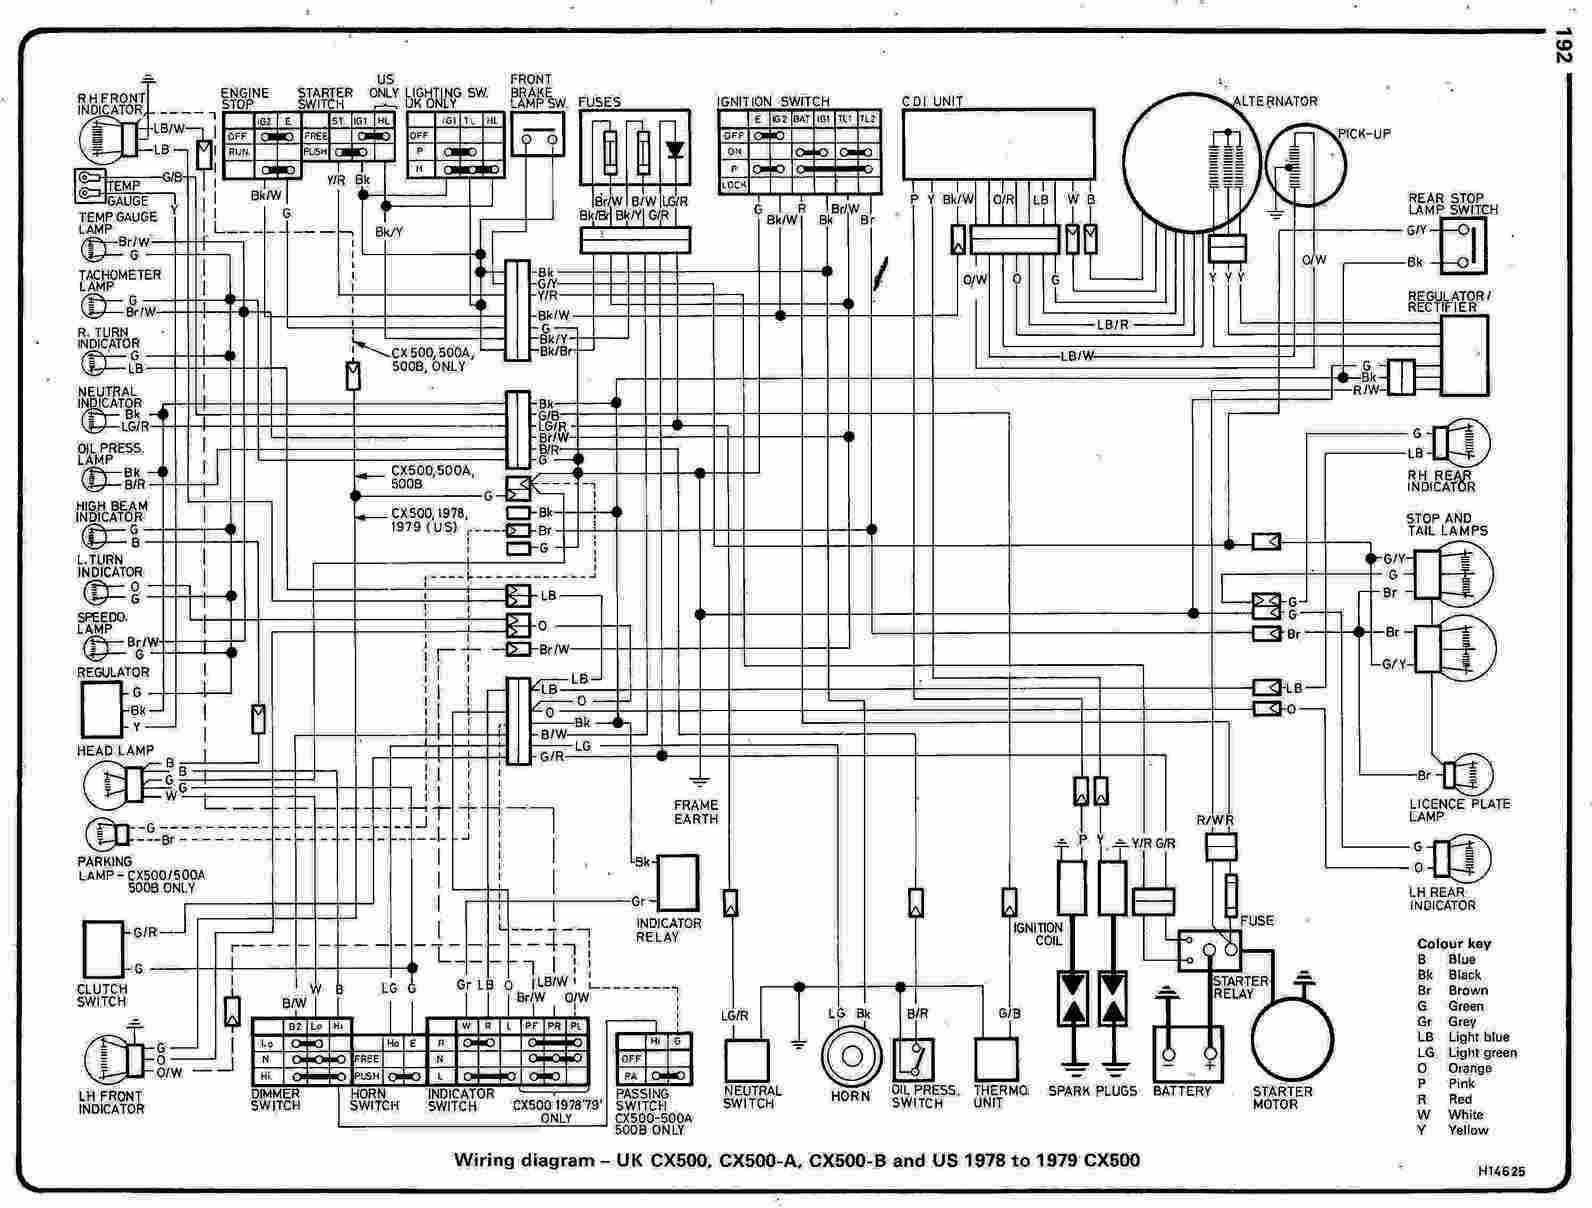 81 honda wiring diagram wiring diagram blog 81 honda gl500 wiring diagram 81 honda wiring diagram [ 1592 x 1208 Pixel ]